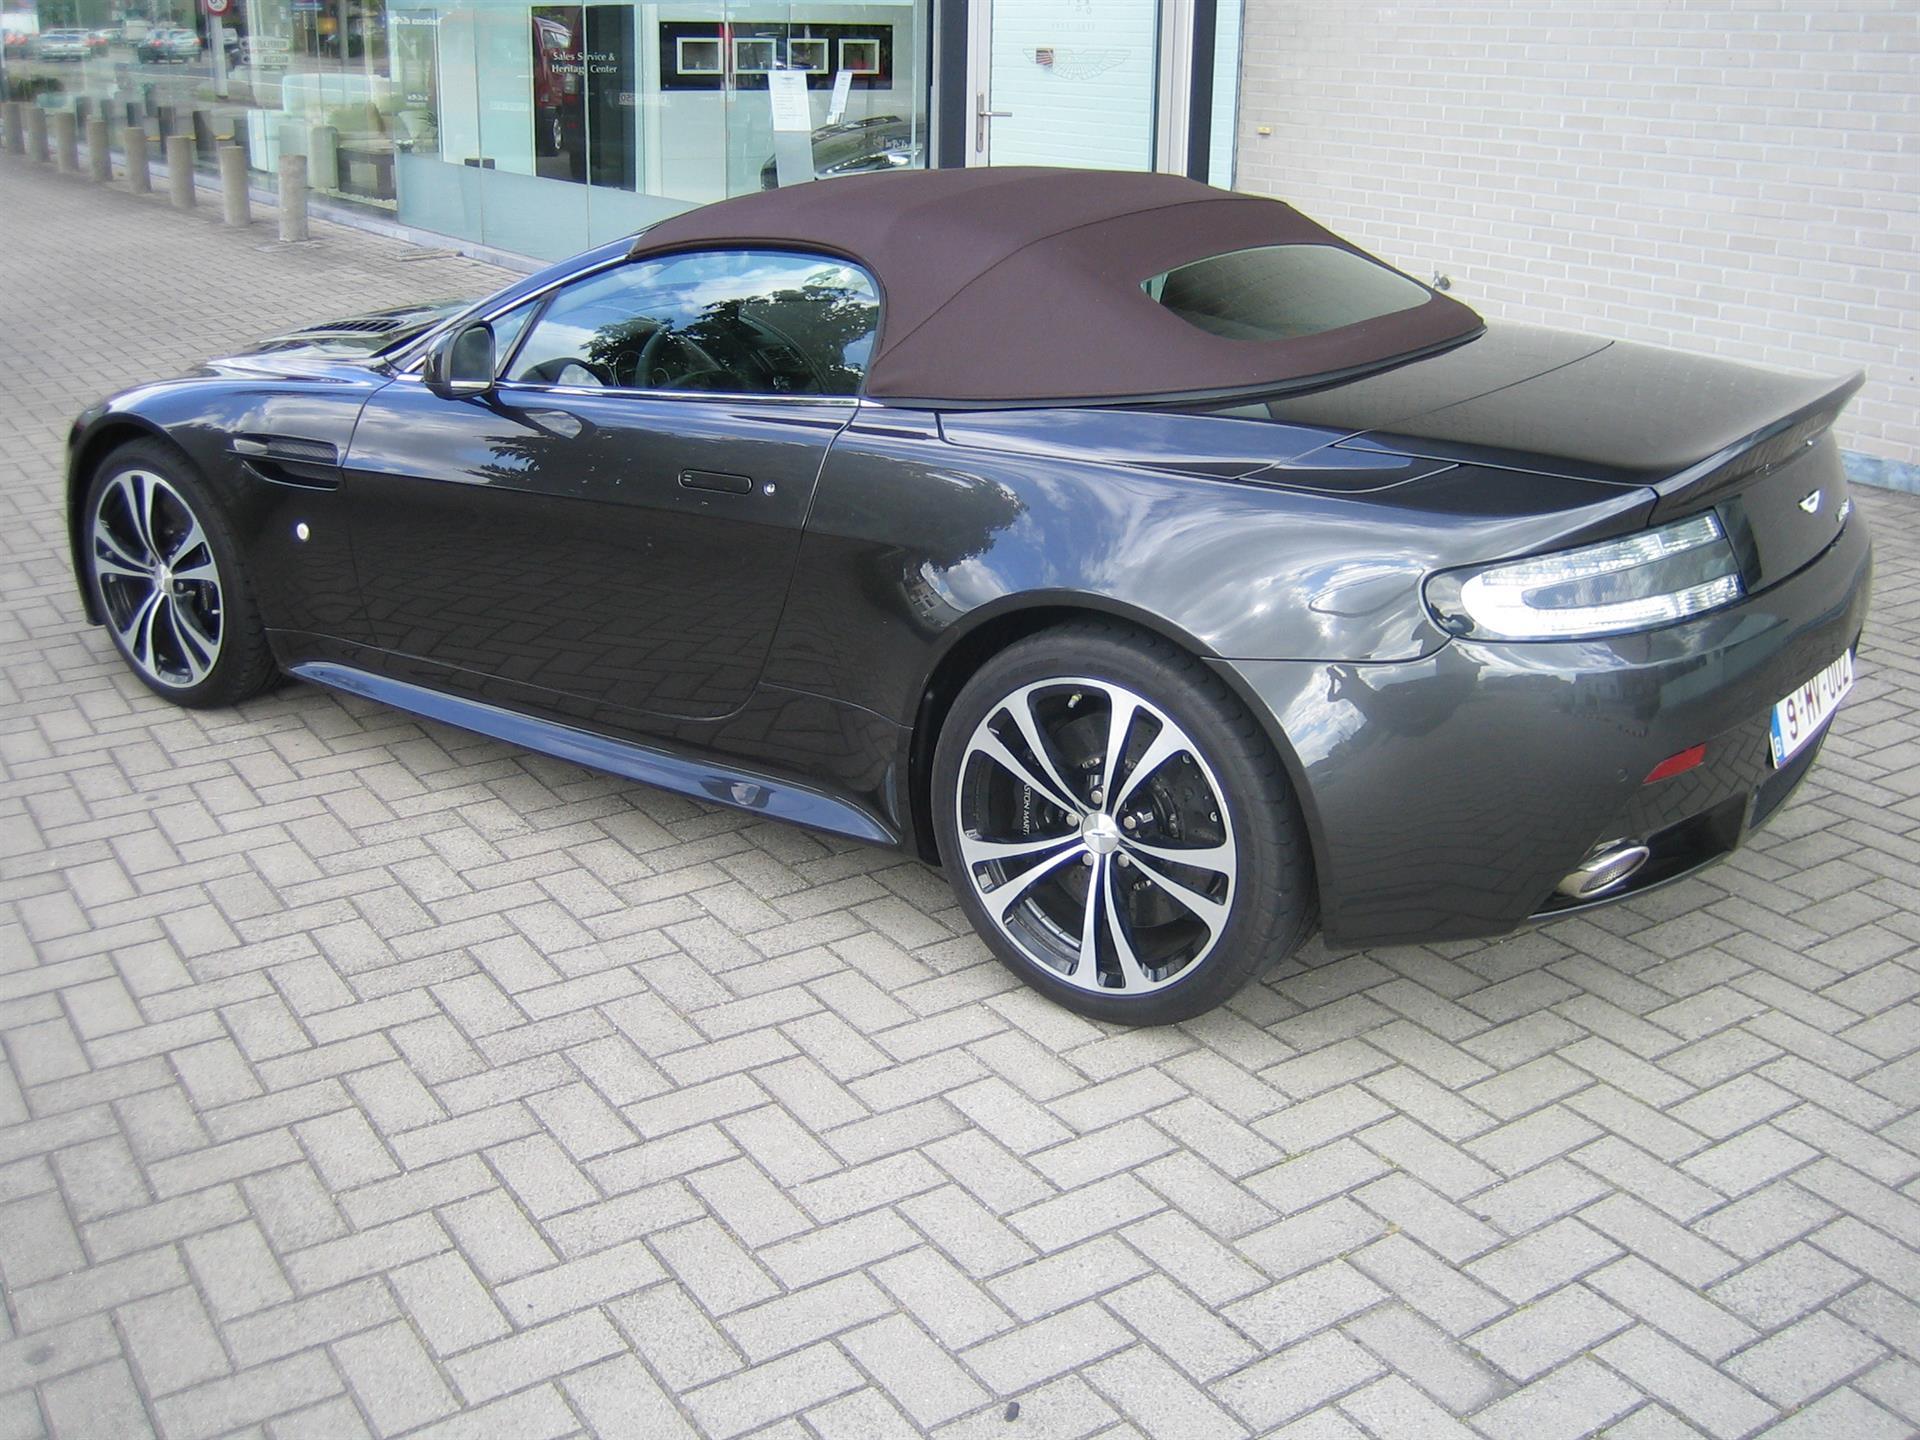 Aston Martin Lagonda - Pre-Owned & Used Aston Martins - Car Details ...